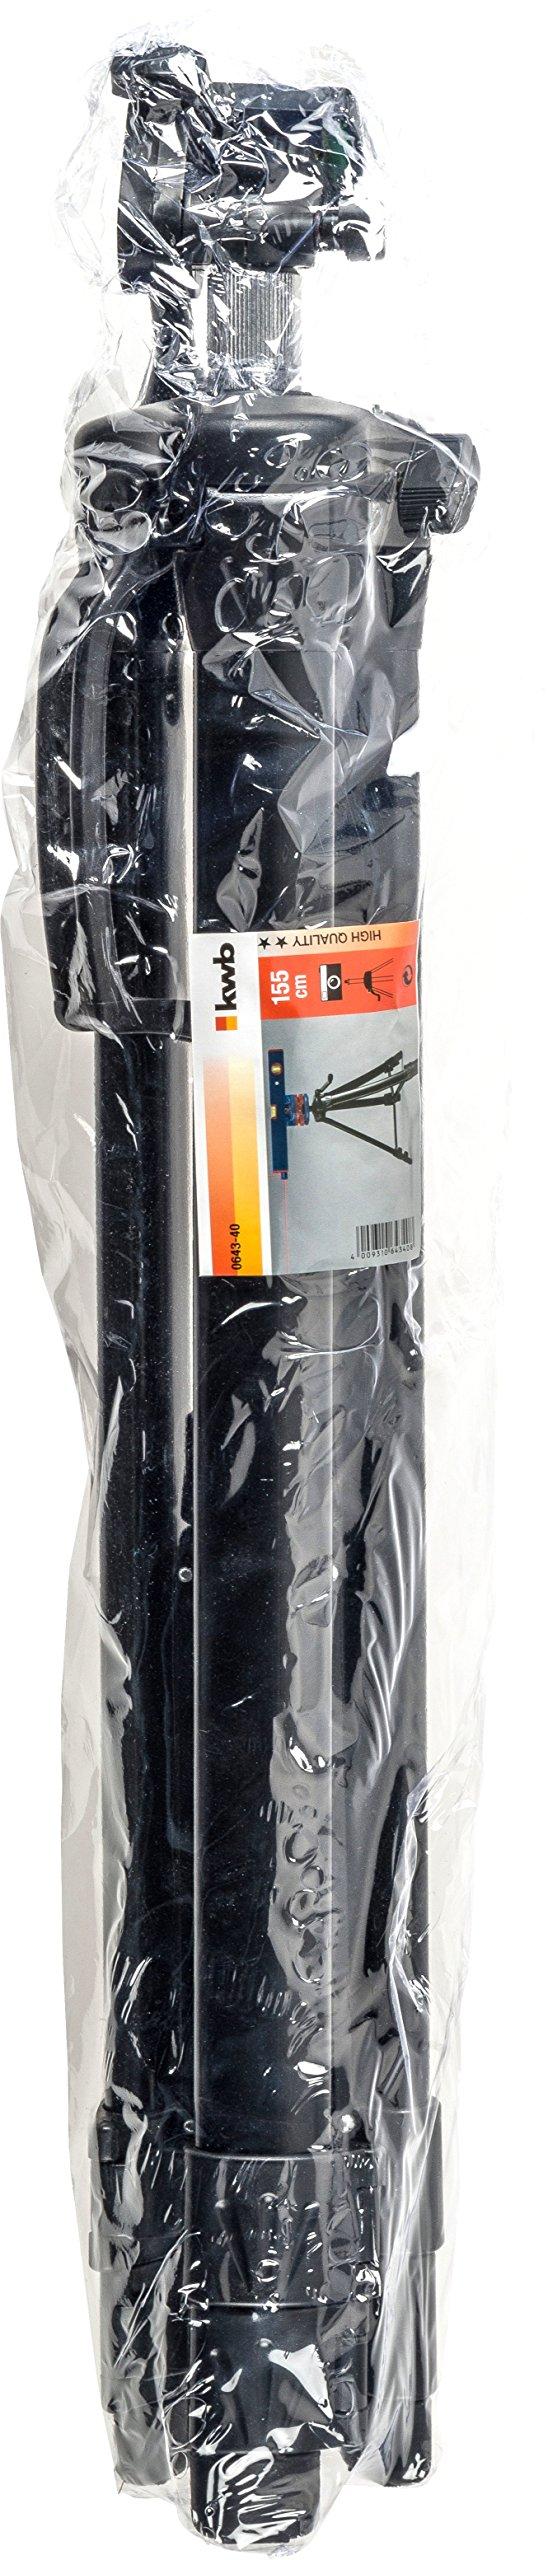 40 cm KWB 49065040 Nivel